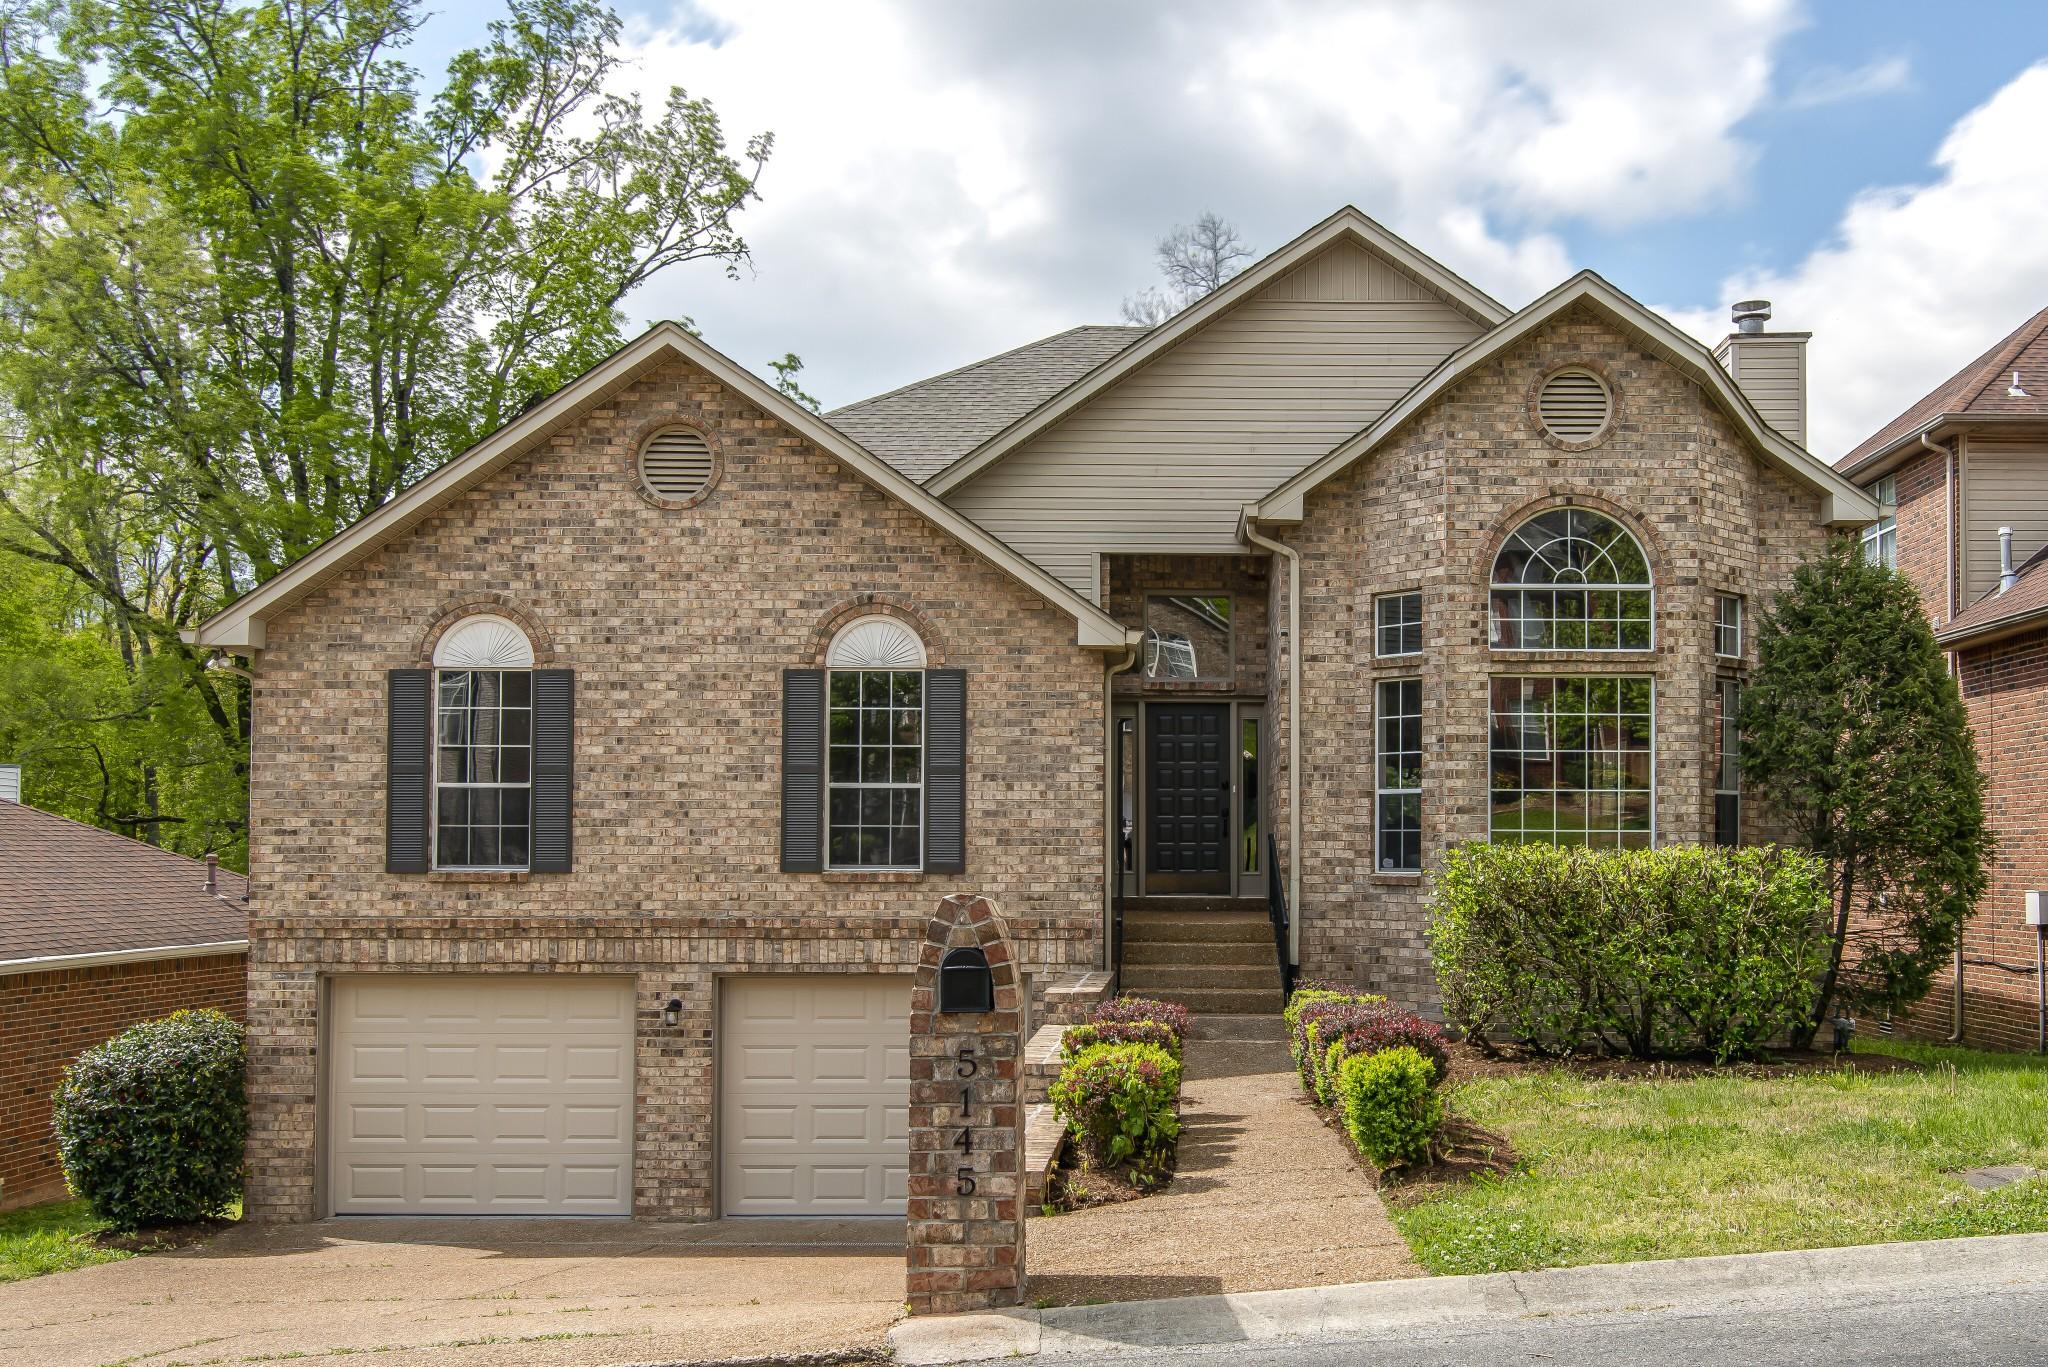 5145 W Oak Highland Dr Property Photo - Antioch, TN real estate listing